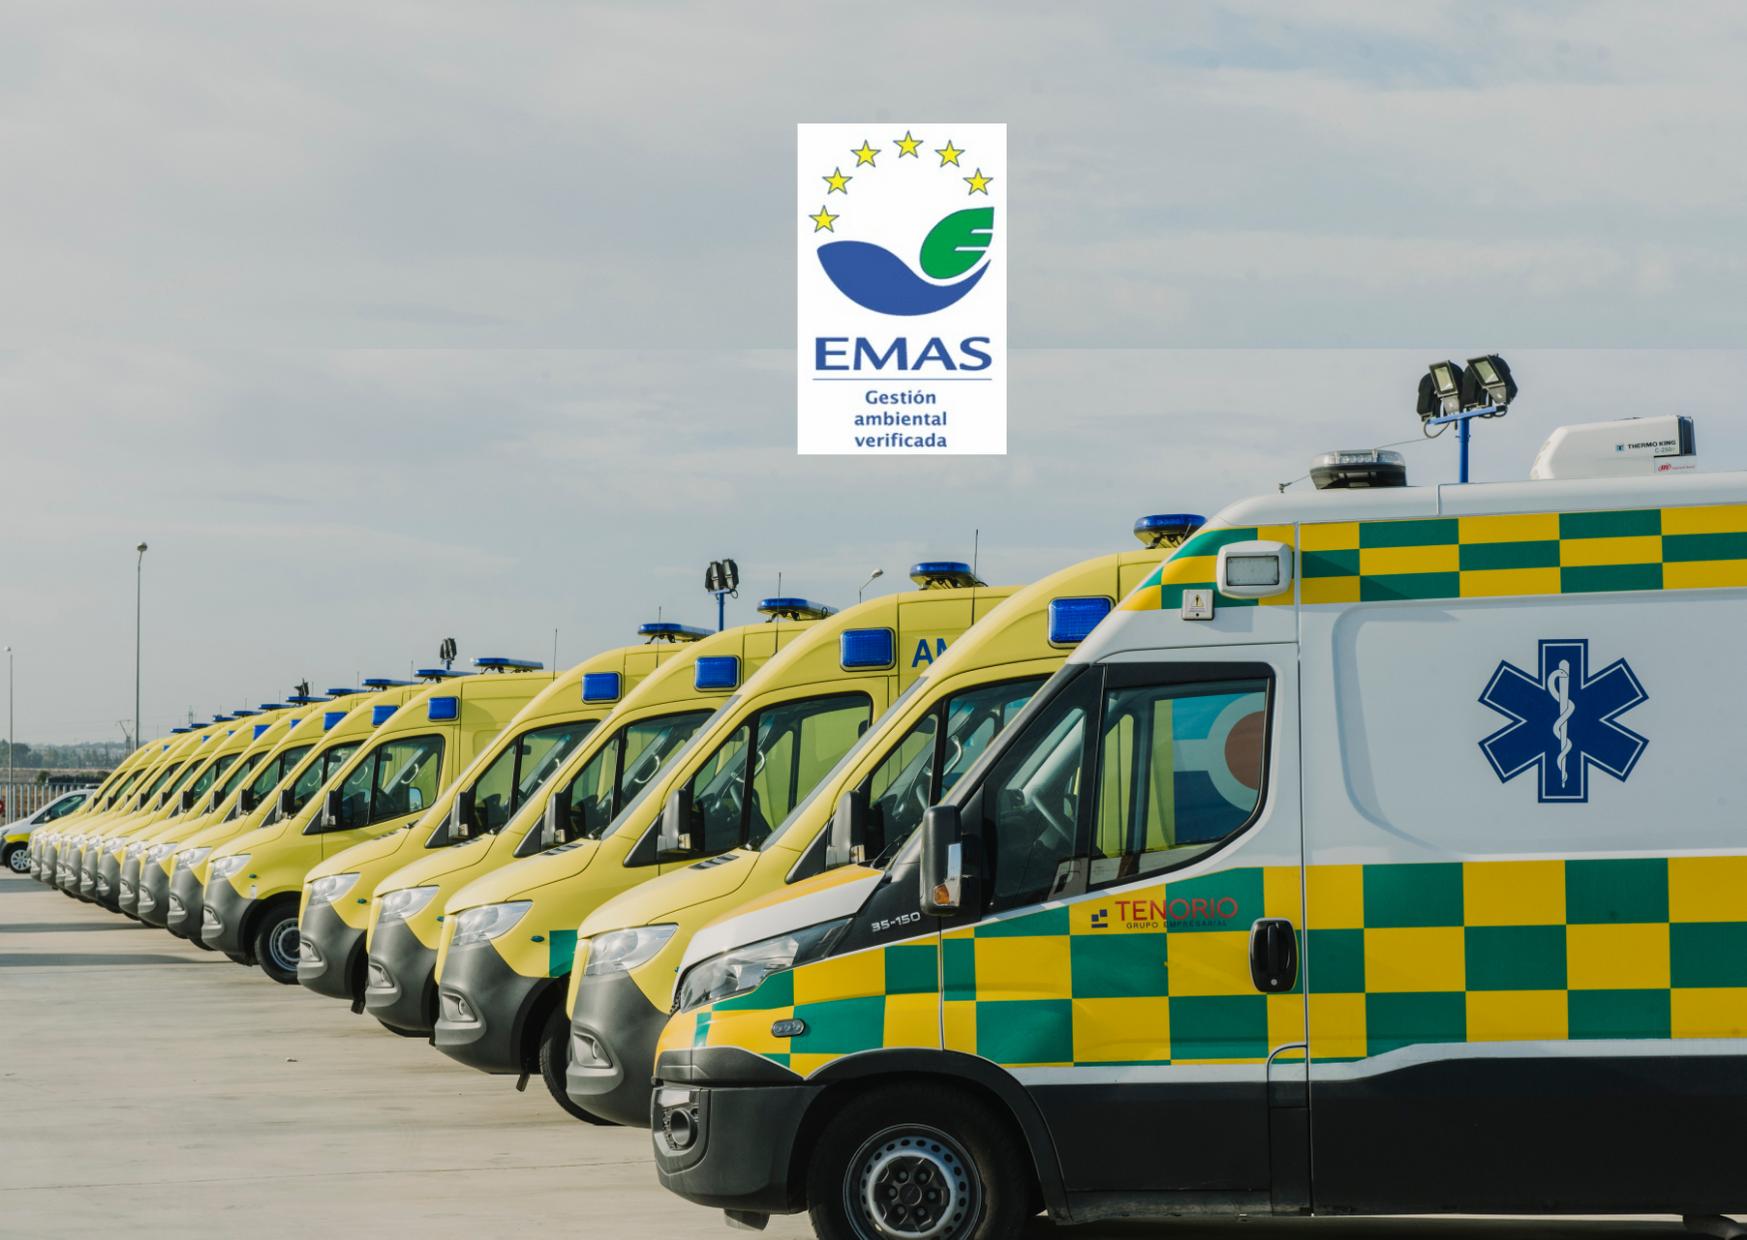 https://ambulanciastenorio.com/wp-content/uploads/2021/01/empresa-adherida-al-reglamento-emas.png